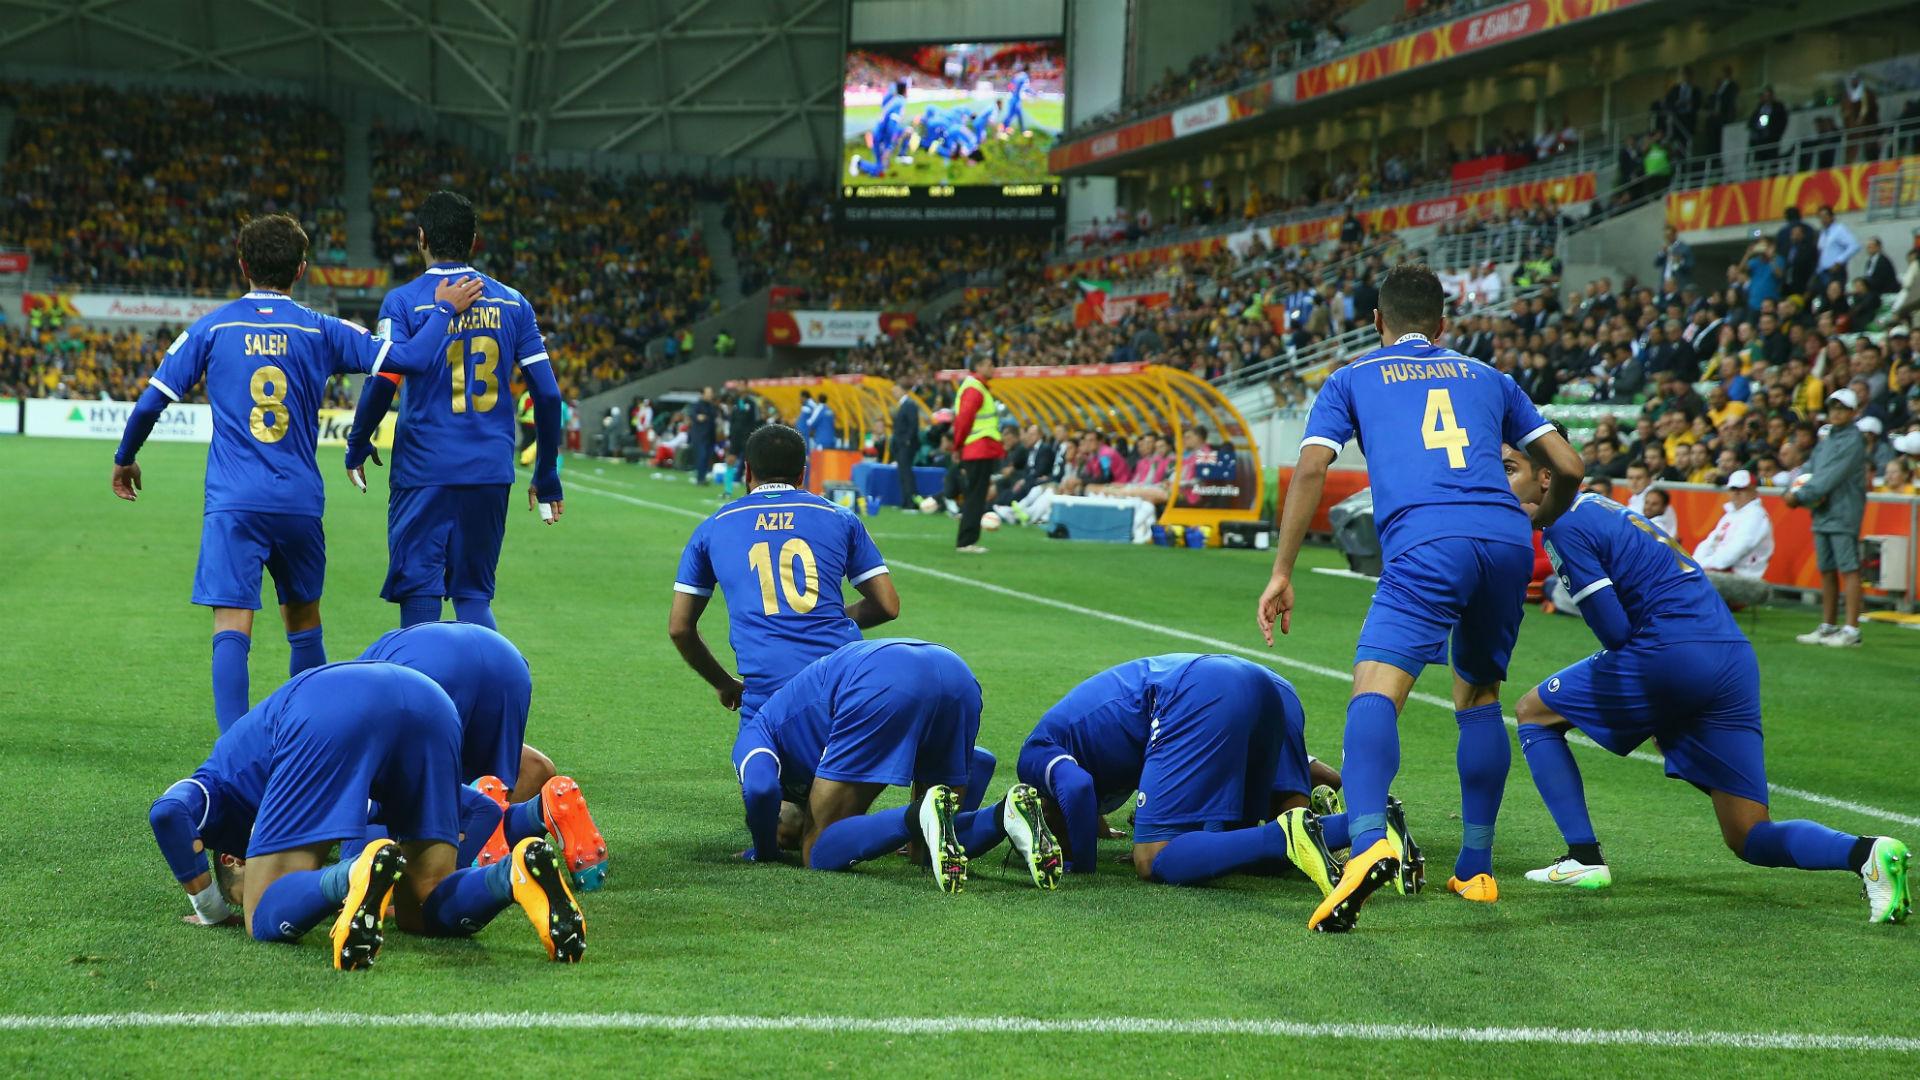 Kuwait - AFC Asian Cup 2015